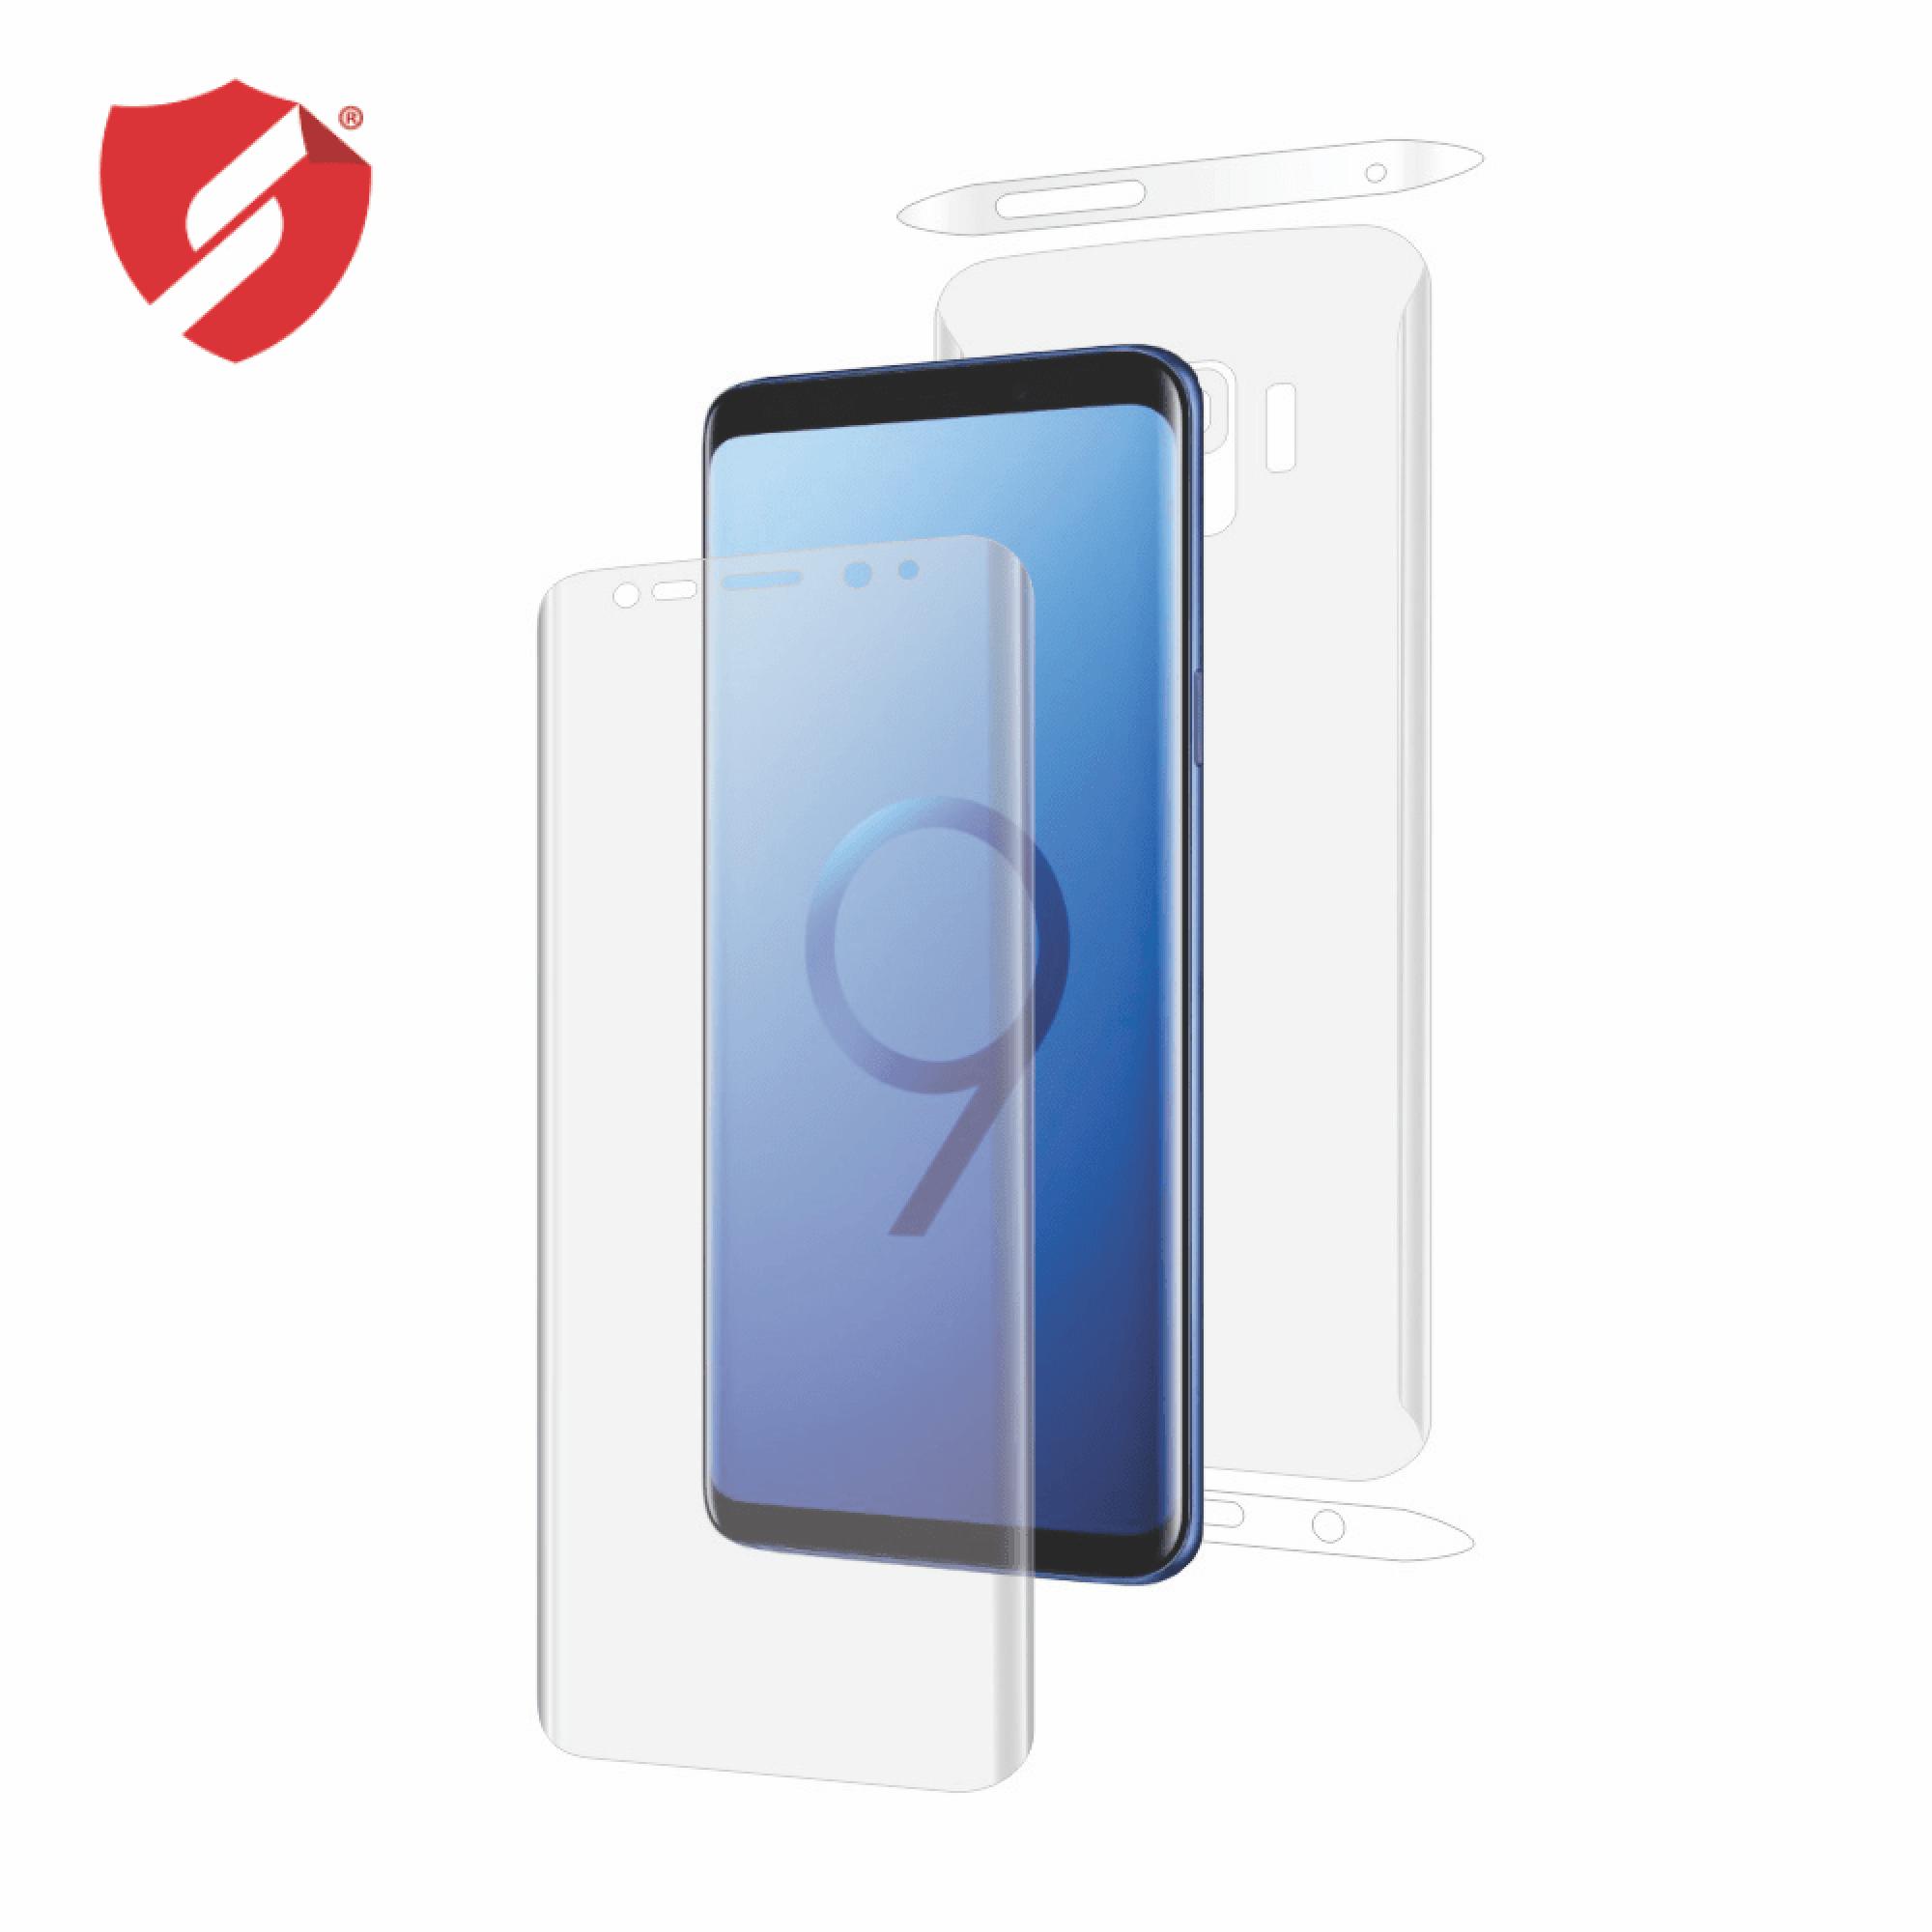 Folie de protectie Smart Protection Samsung Galaxy S9 compatibila cu carcasa Spigen Liquid Air - fullbody - display + spate + laterale imagine